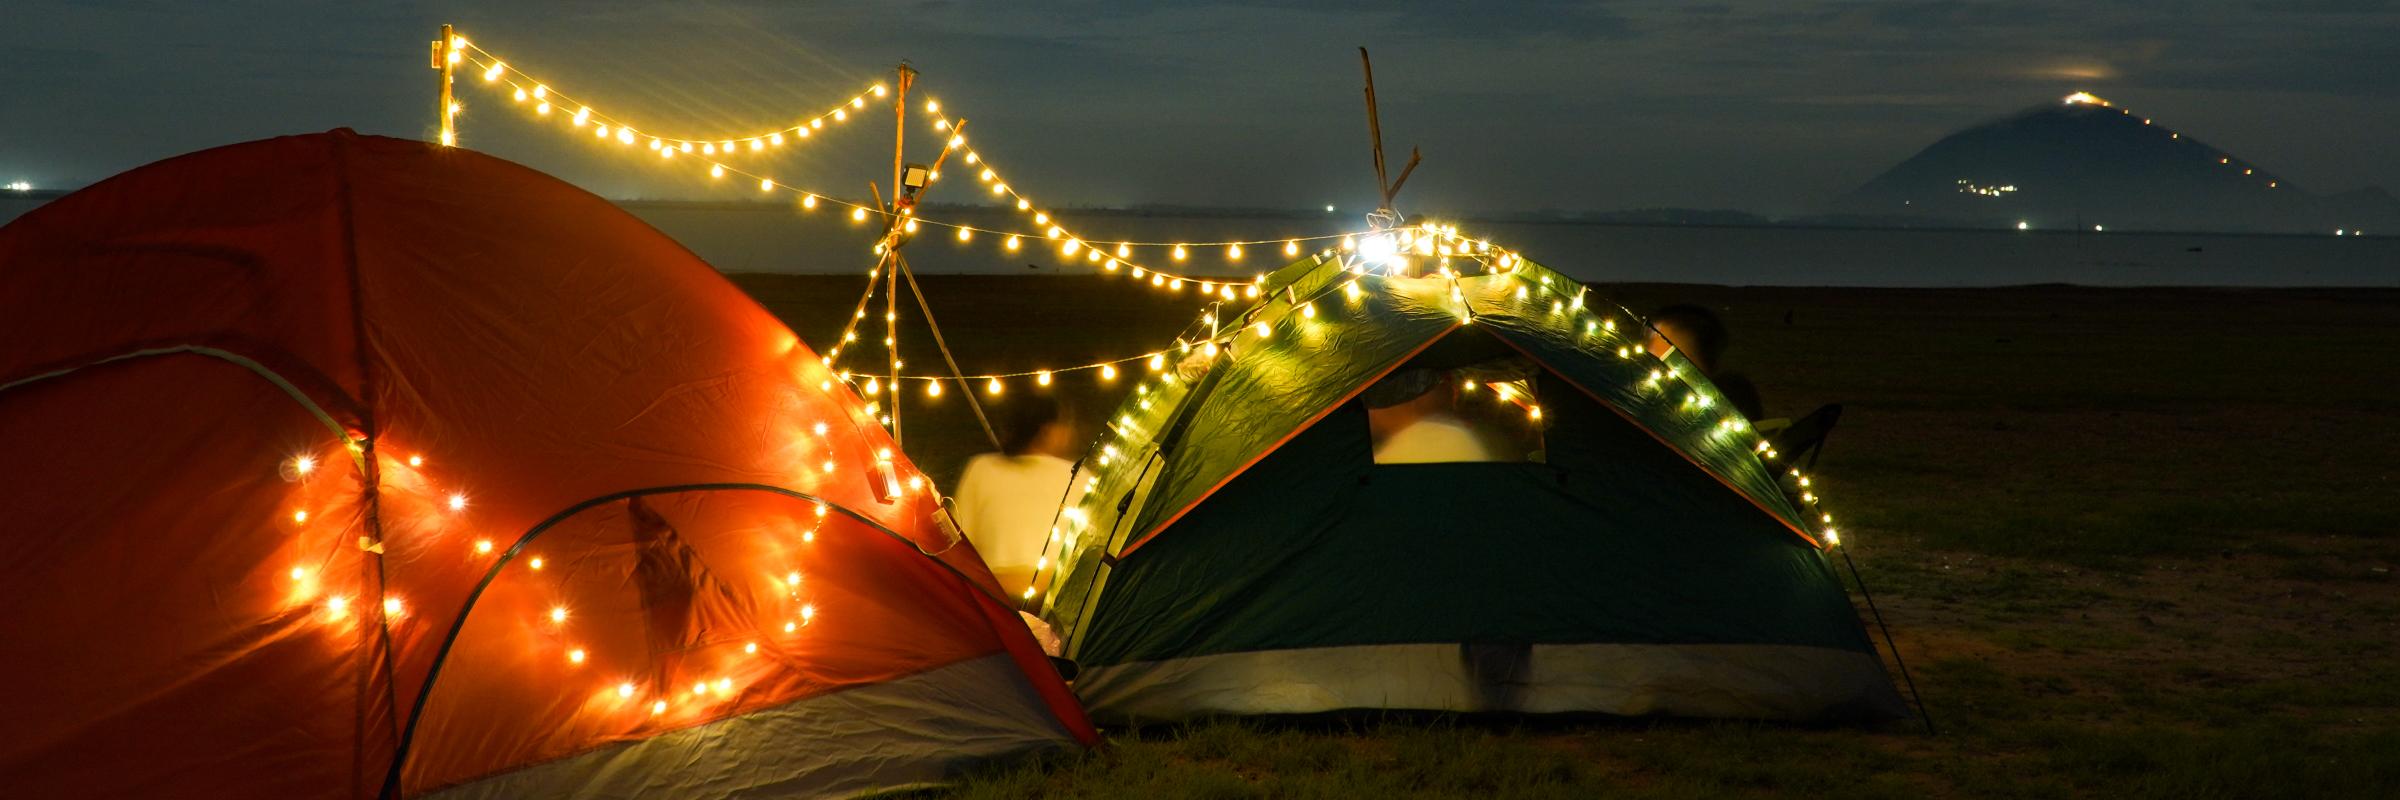 https://gody.vn/blog/phuchuunguyen99959728/post/ho-dau-tieng-camping-7080